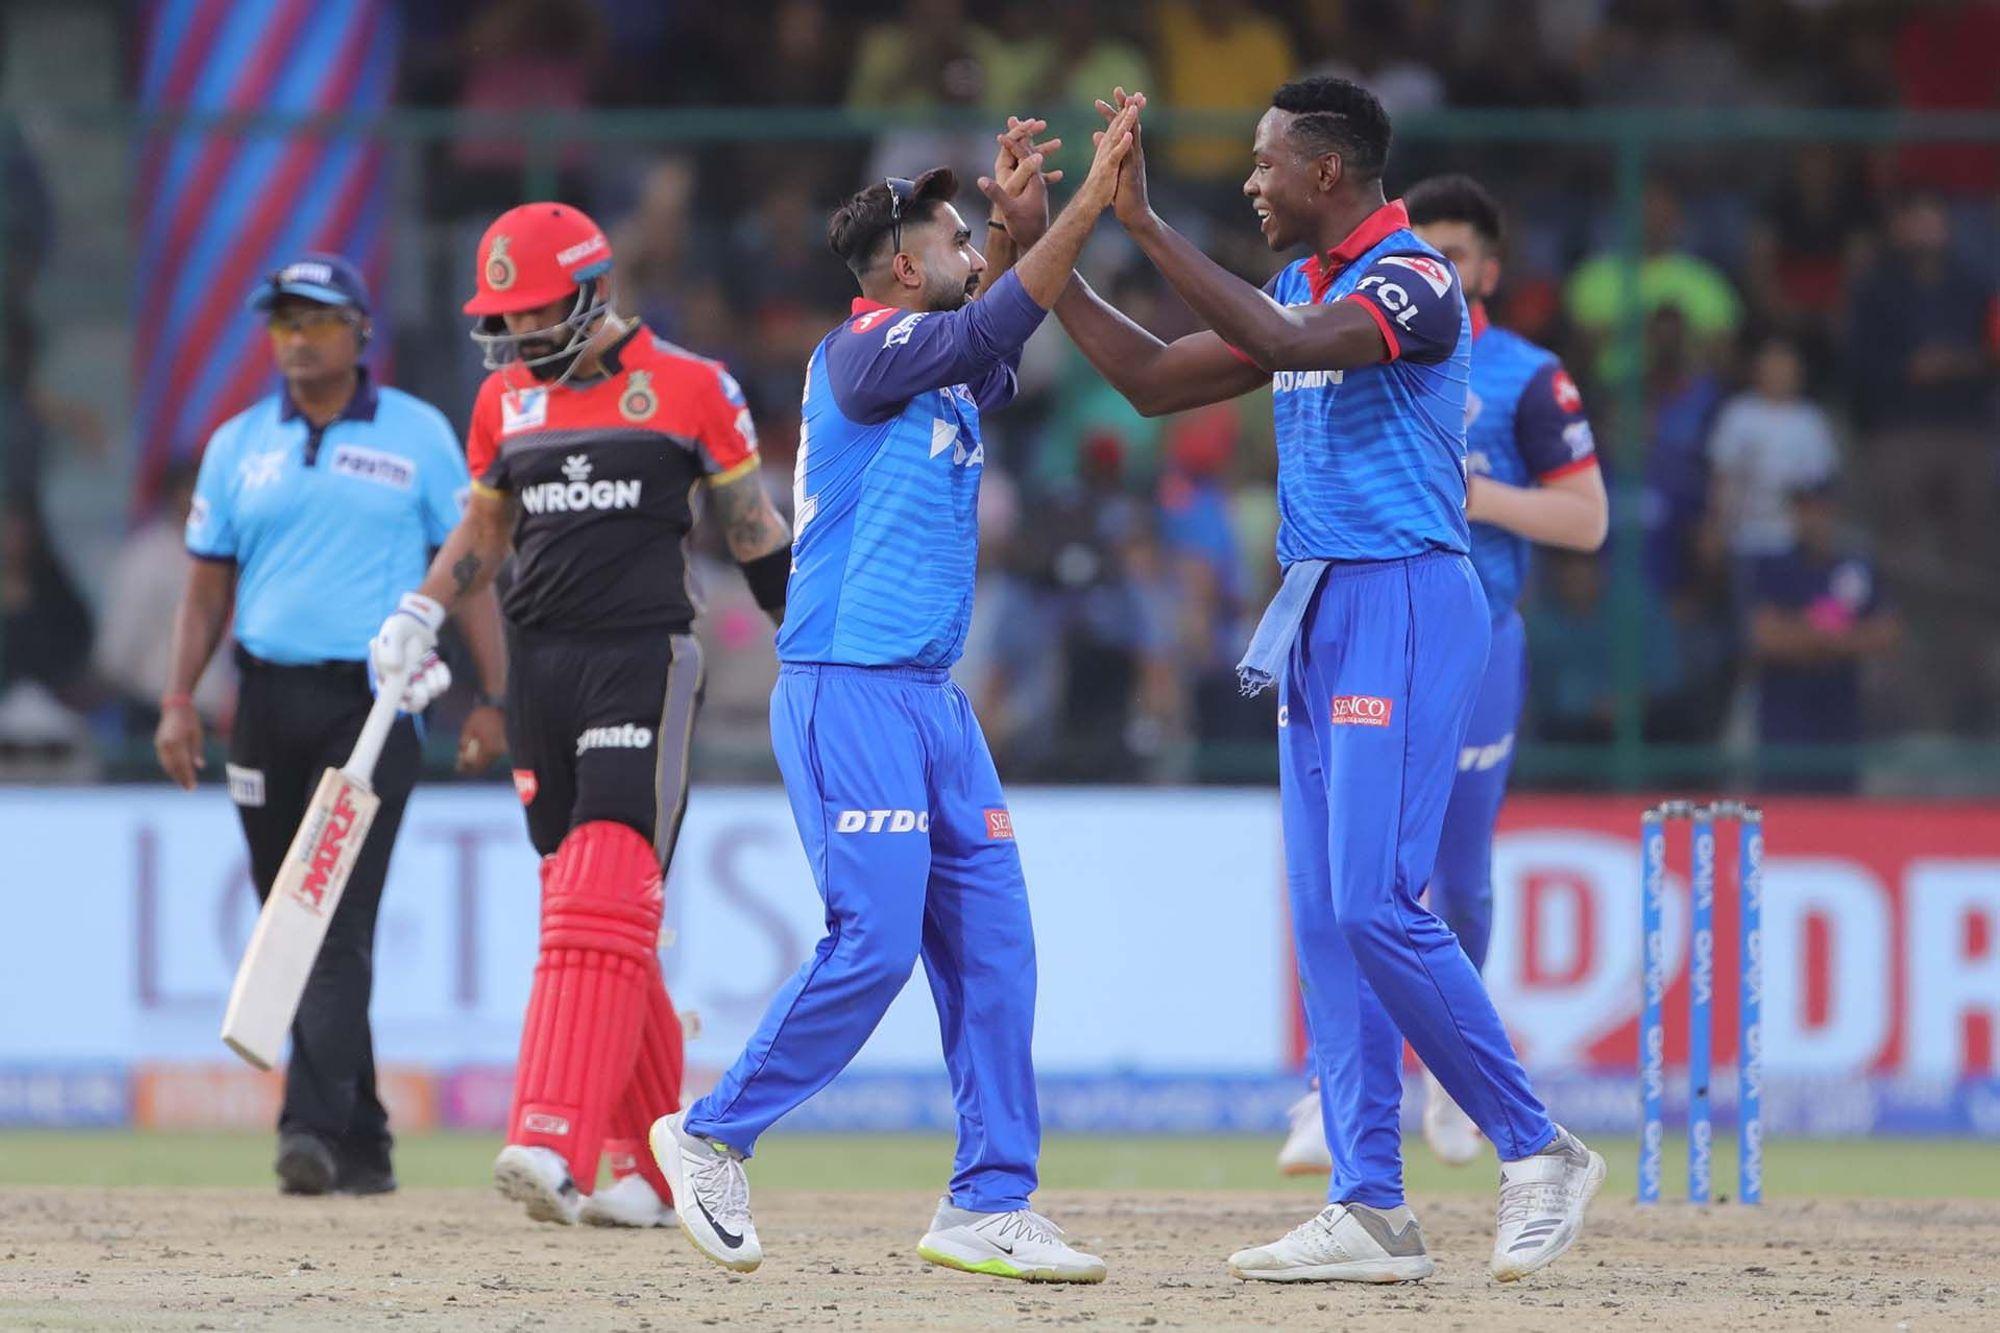 DC vs RCB Match Summary | Match 46 - VIVO IPL 2019